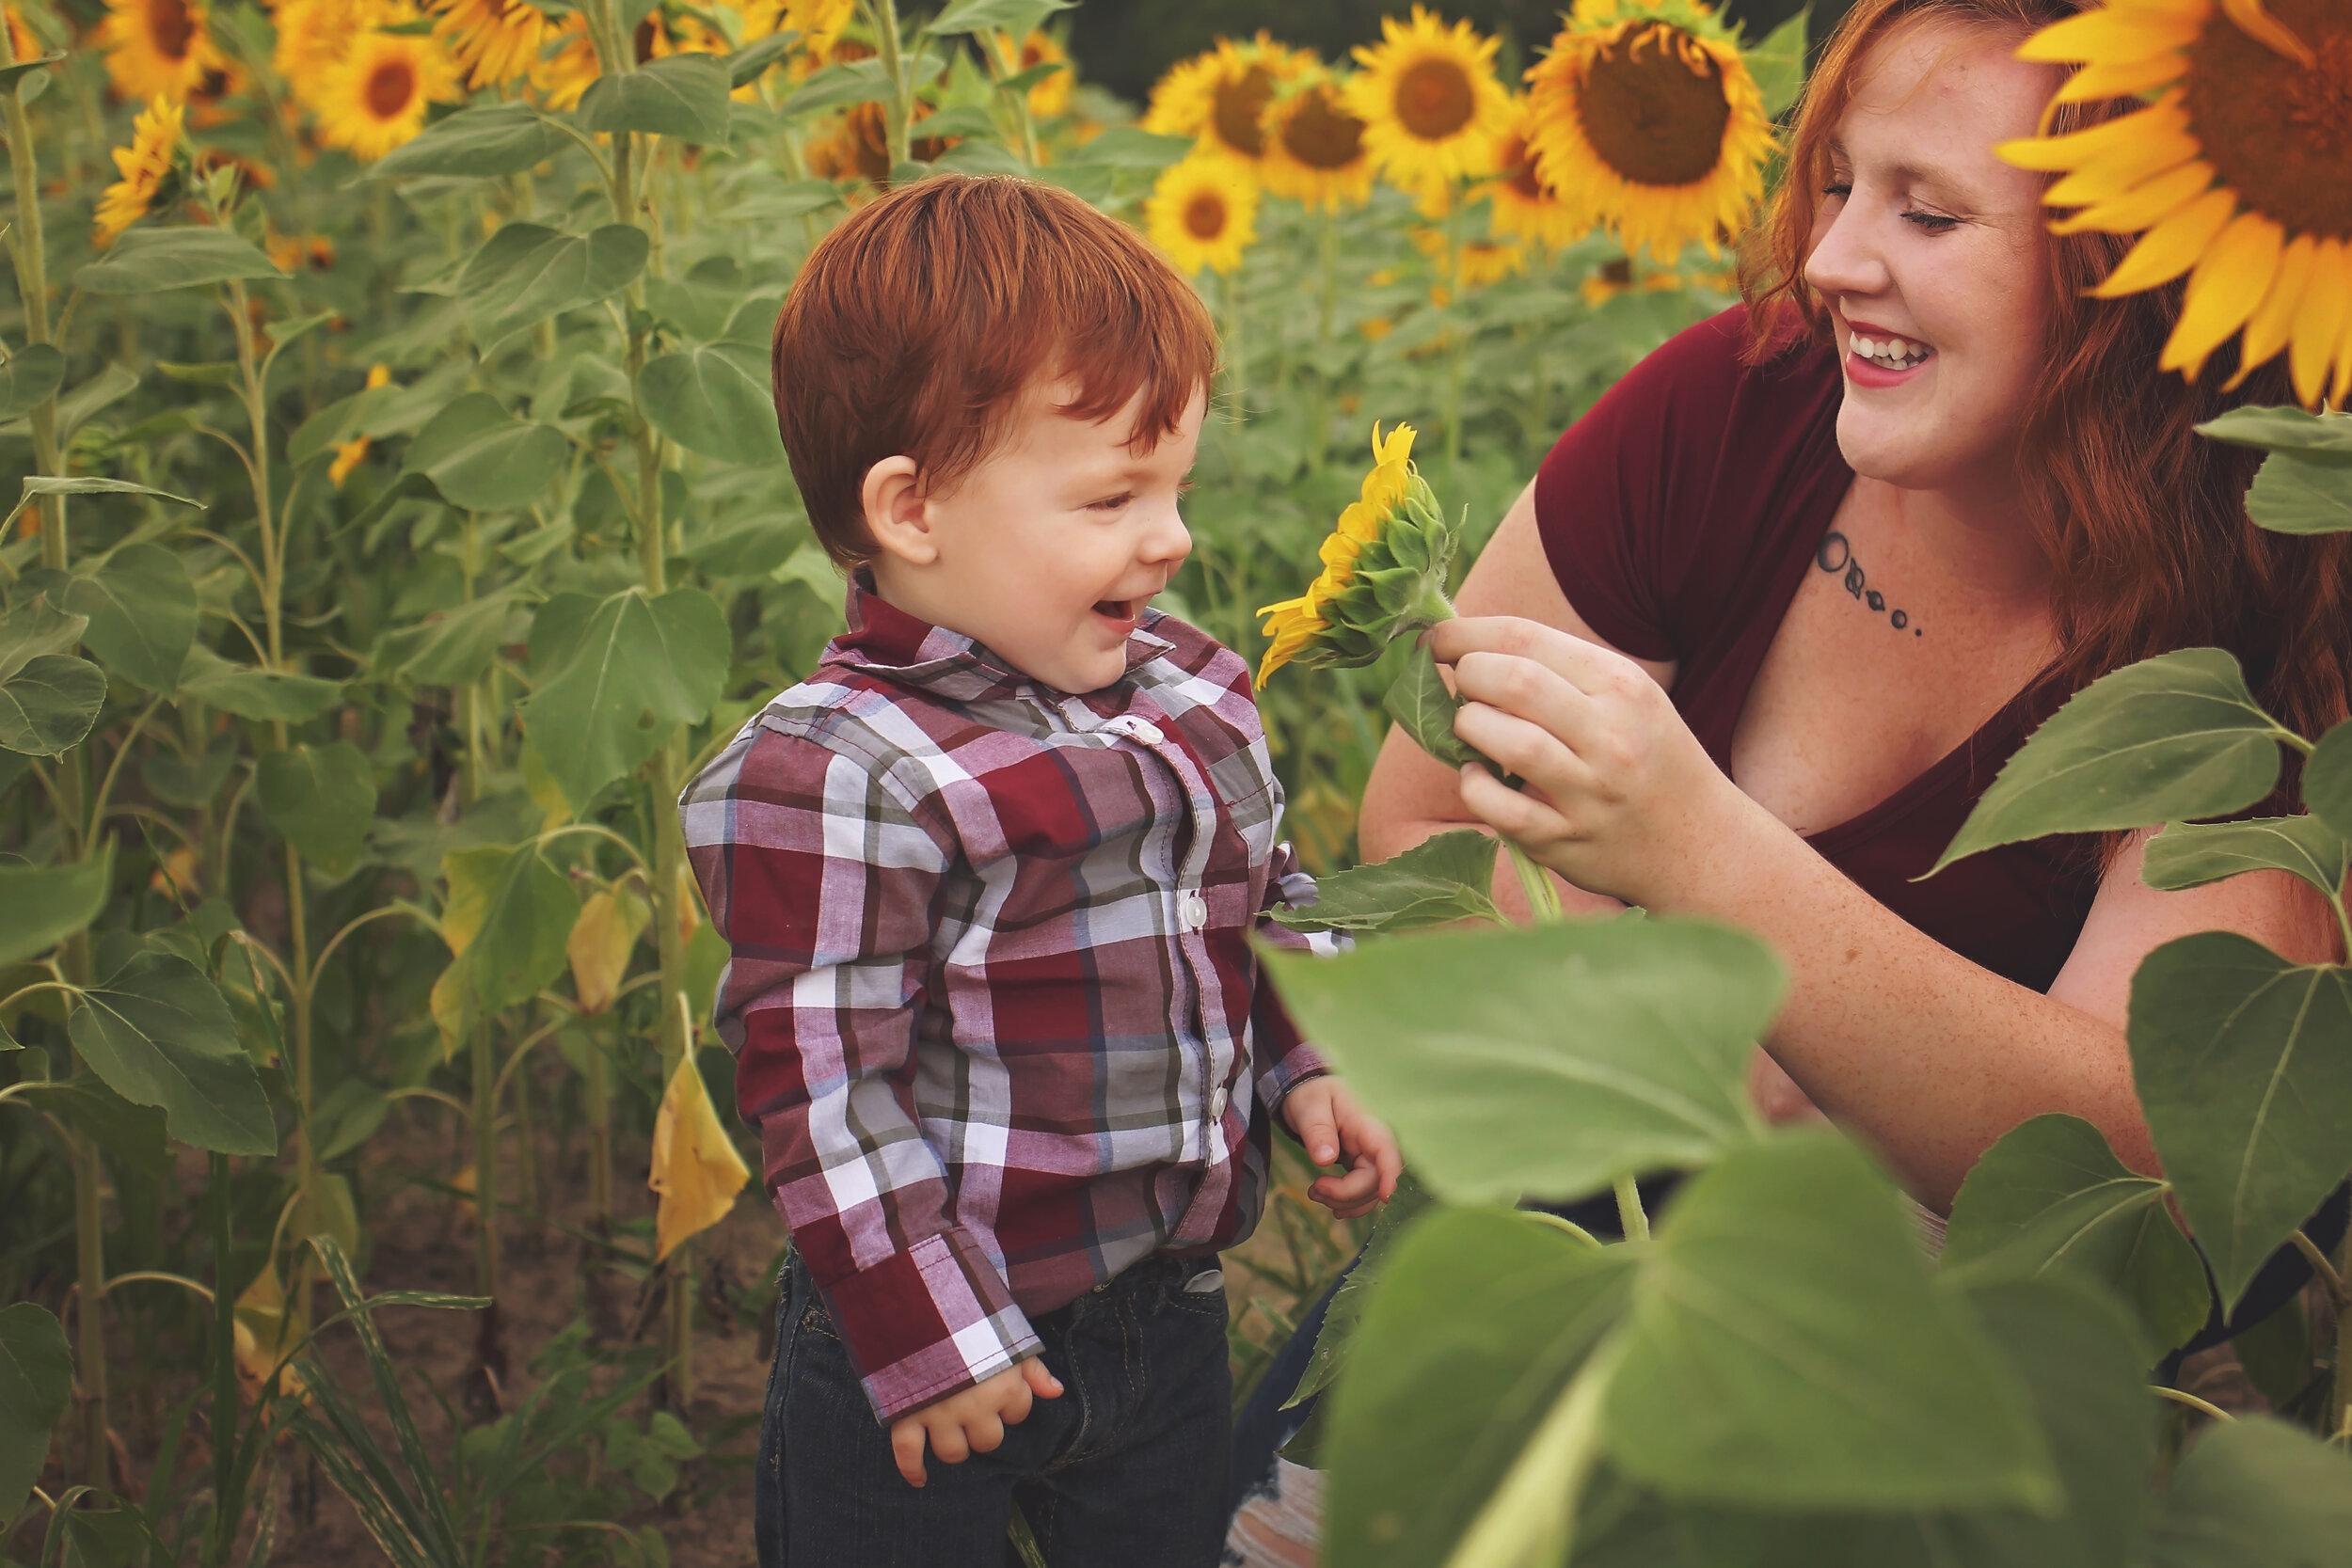 southern-illinois-photographer-benton-sunflower-field-mommy-me-son.jpg